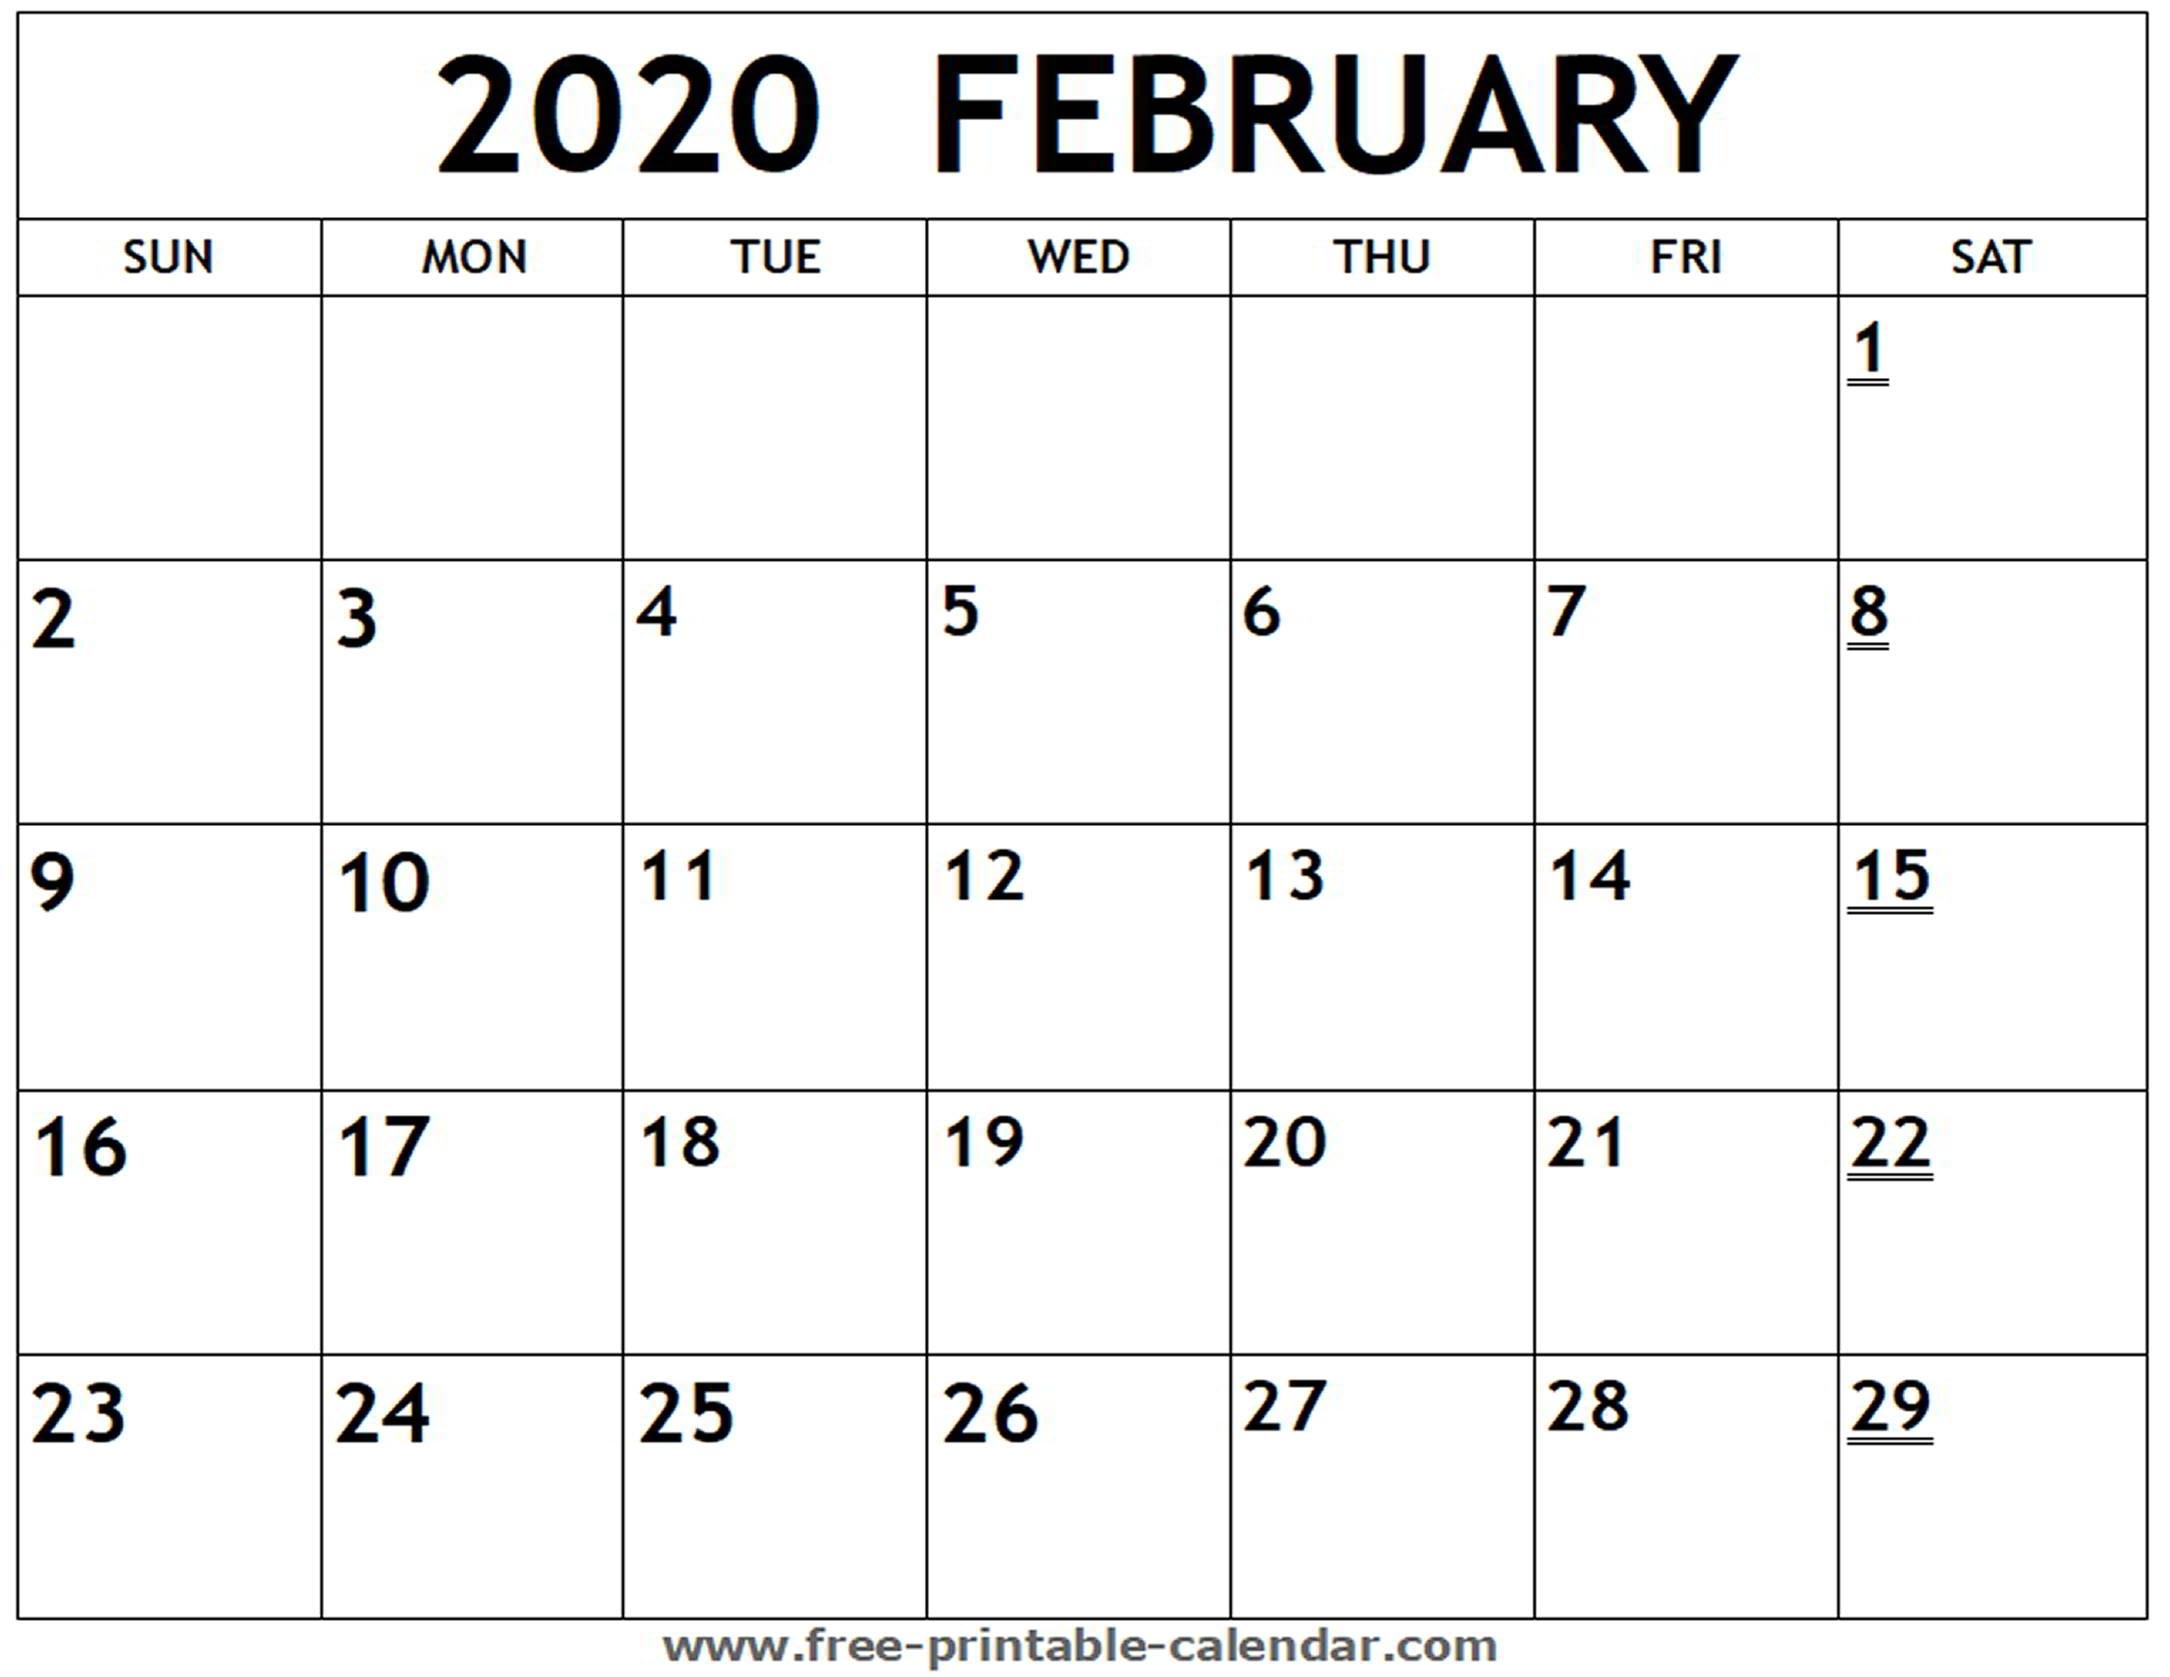 Printable 2020 February Calendar - Free-Printable-Calendar